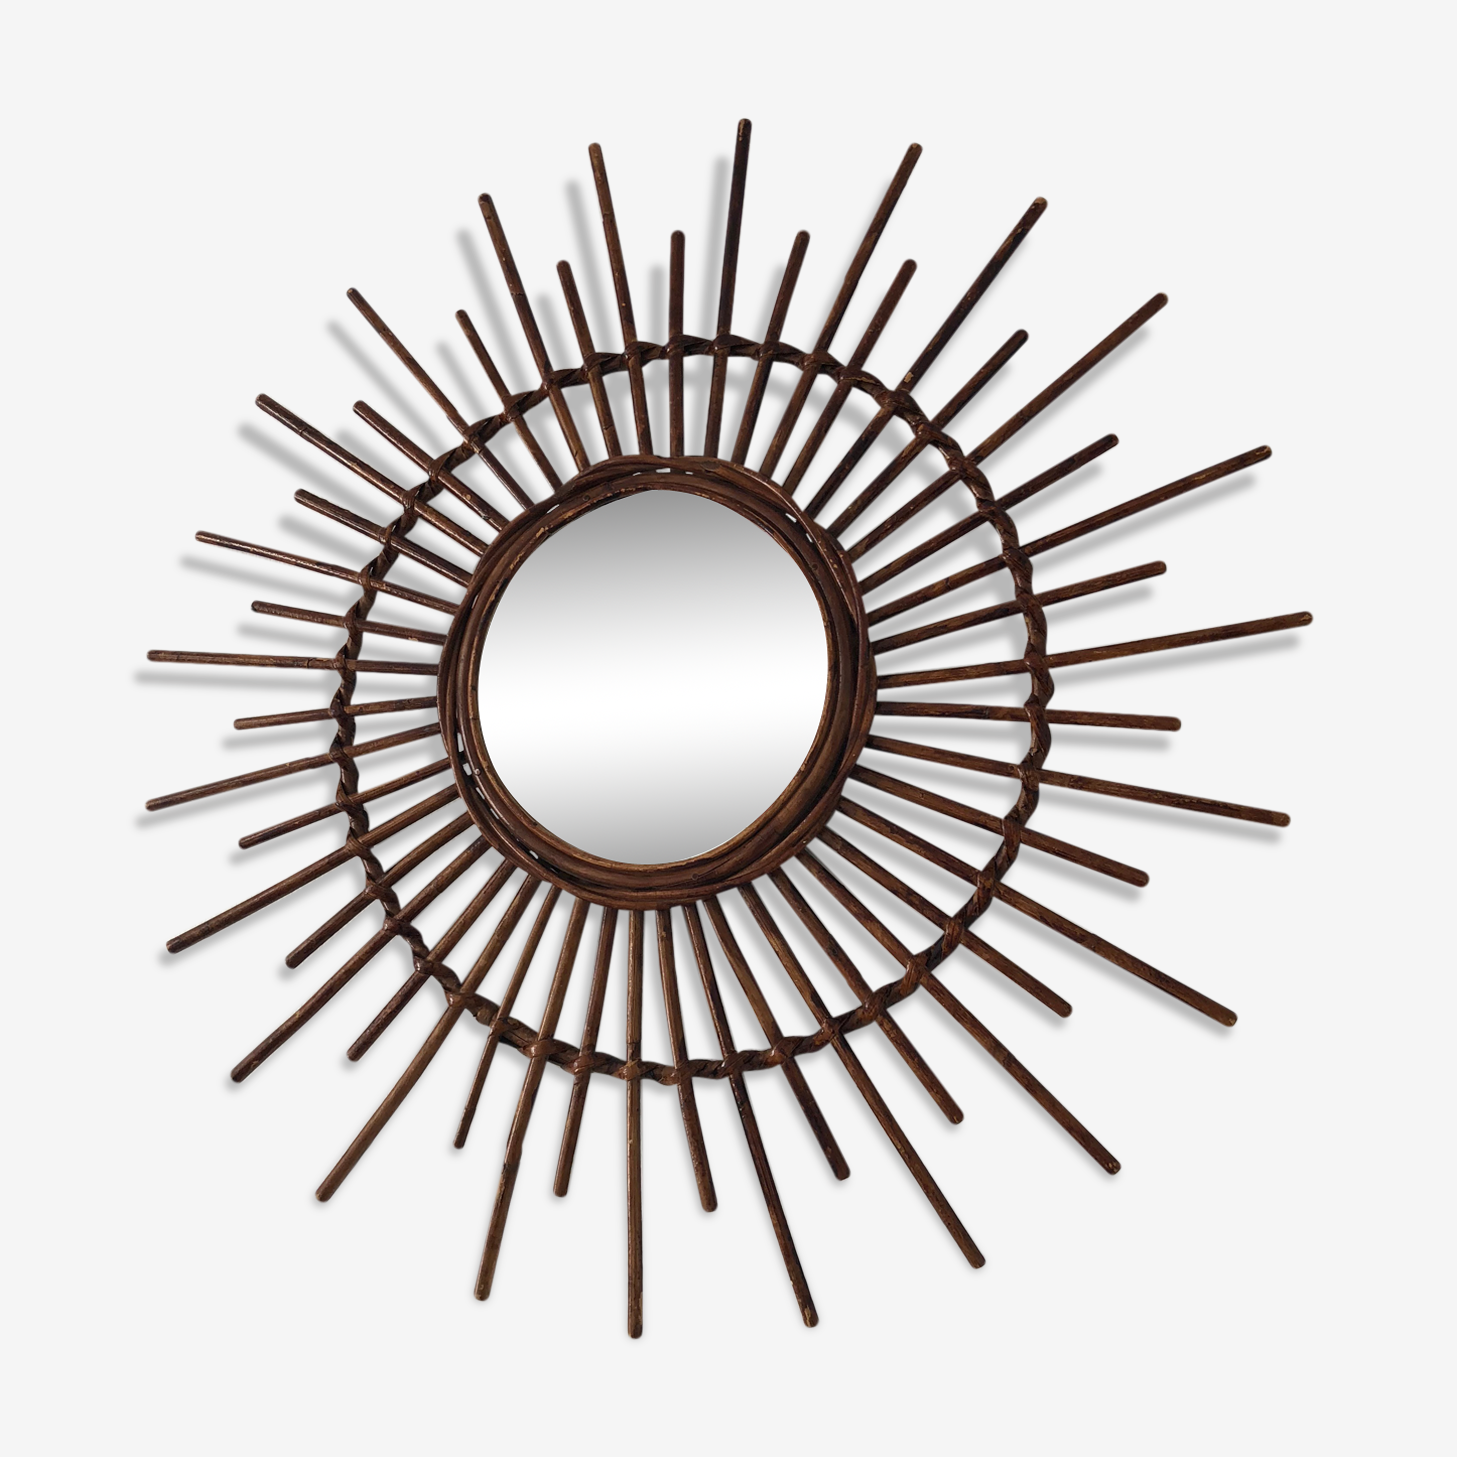 Miroir soleil rotin 65x65cm vintage 1960